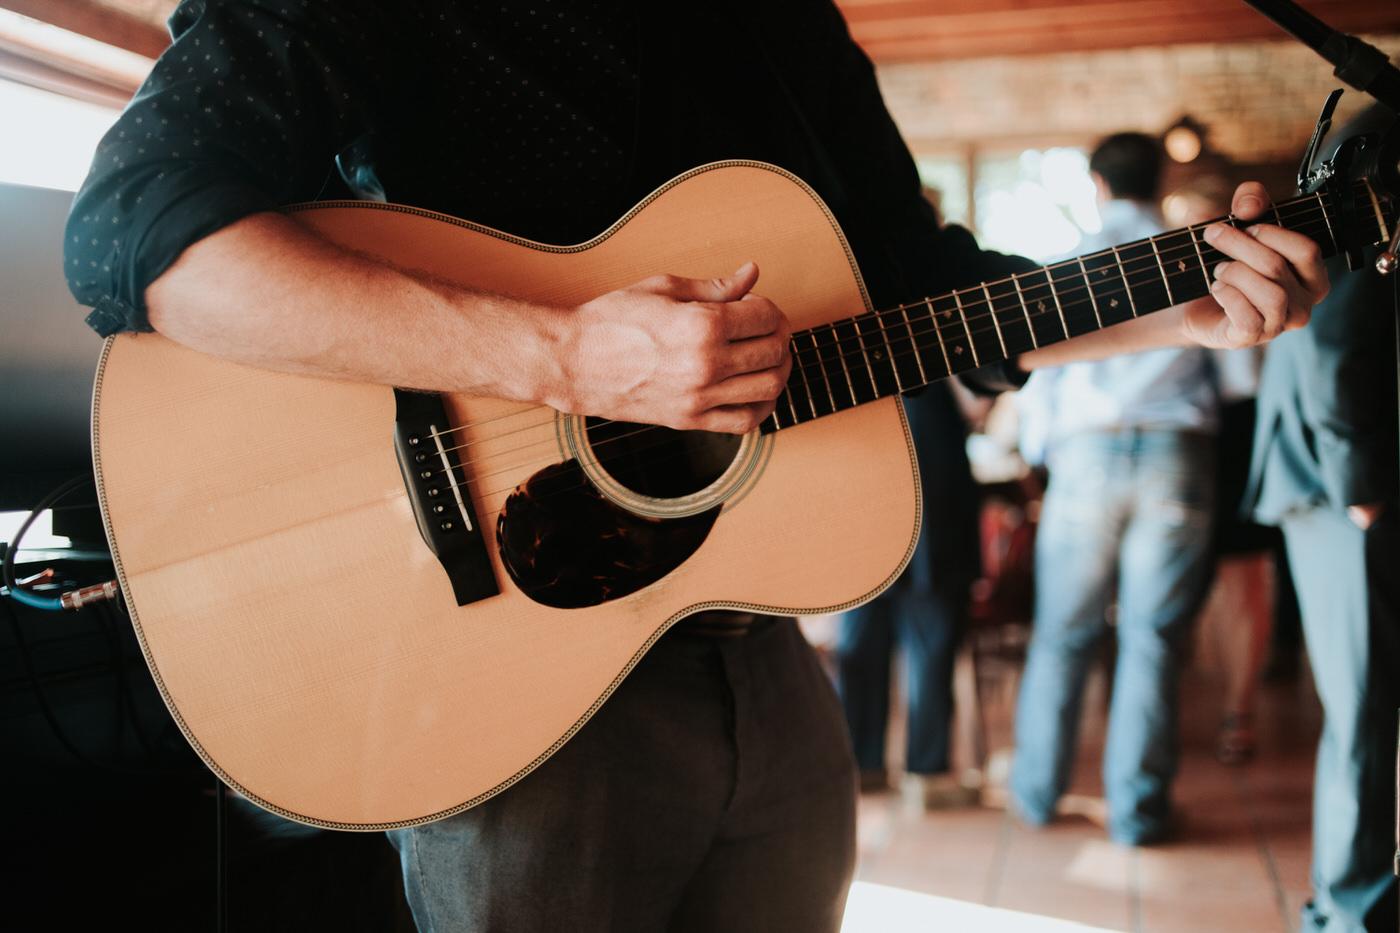 Guitar at wedding reception